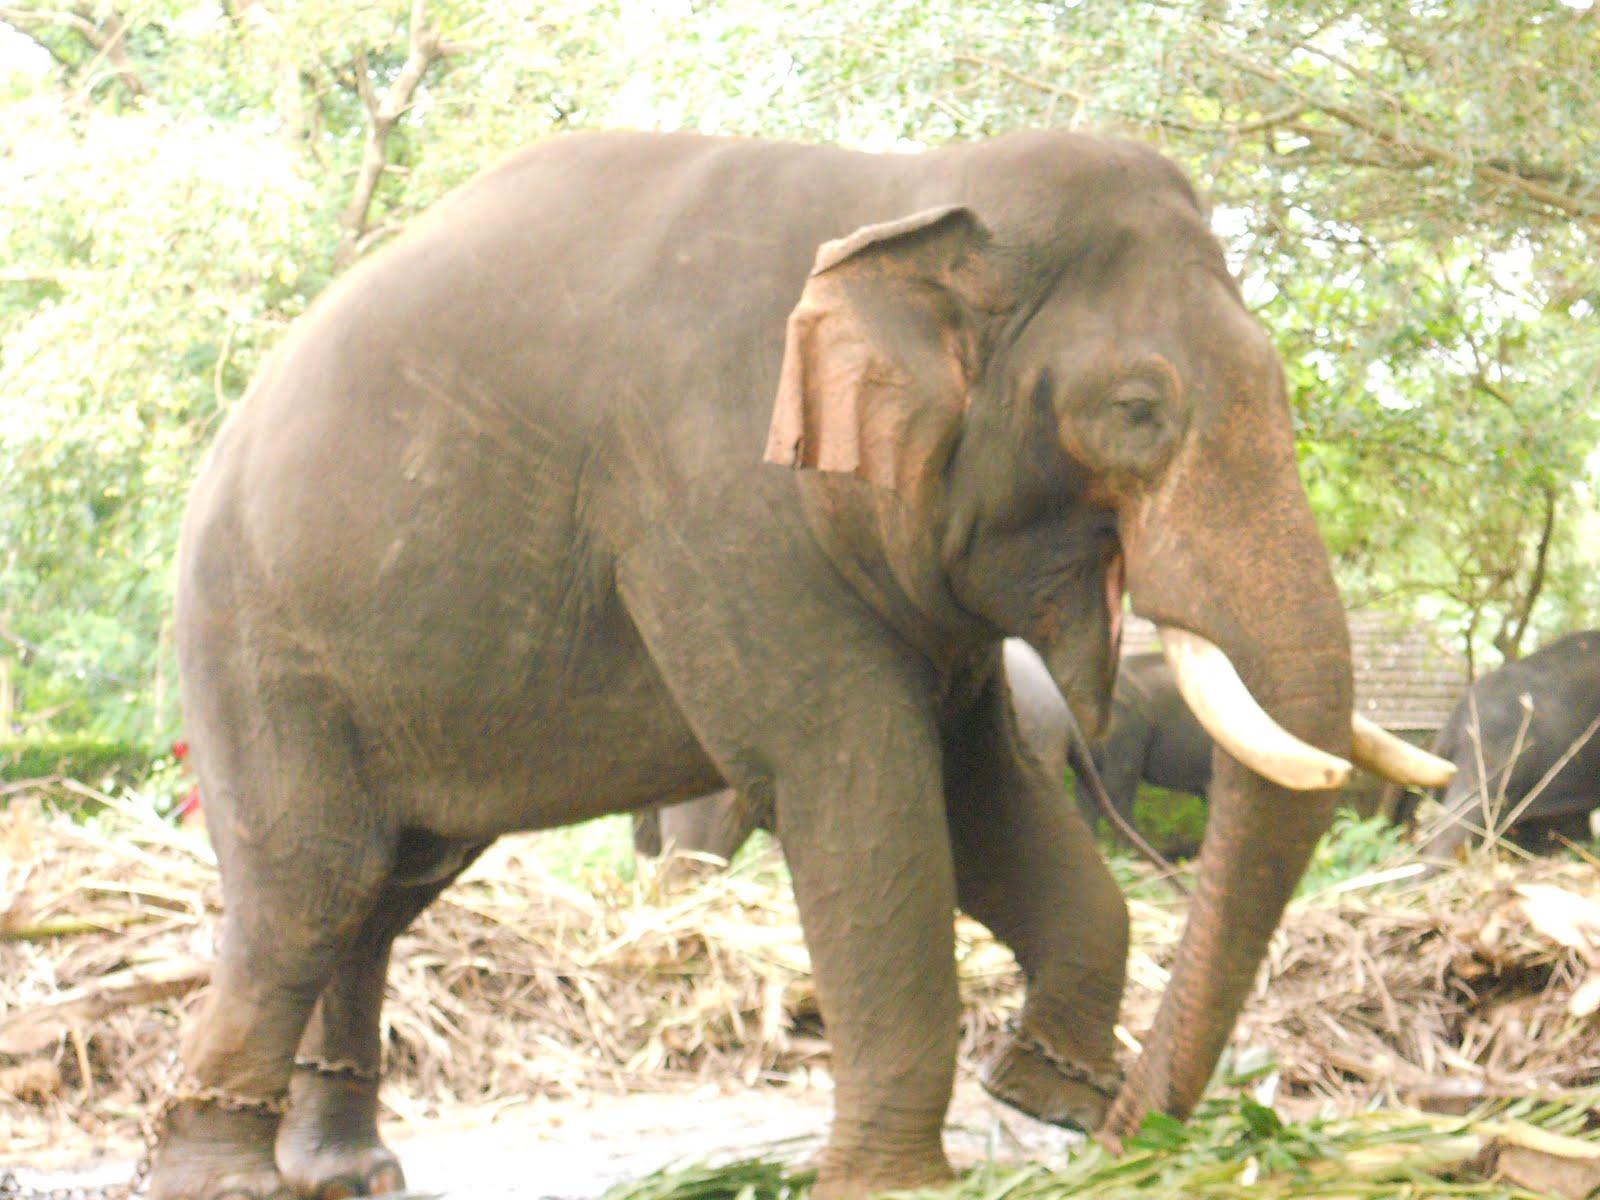 Kerala Elephant Wallpaper